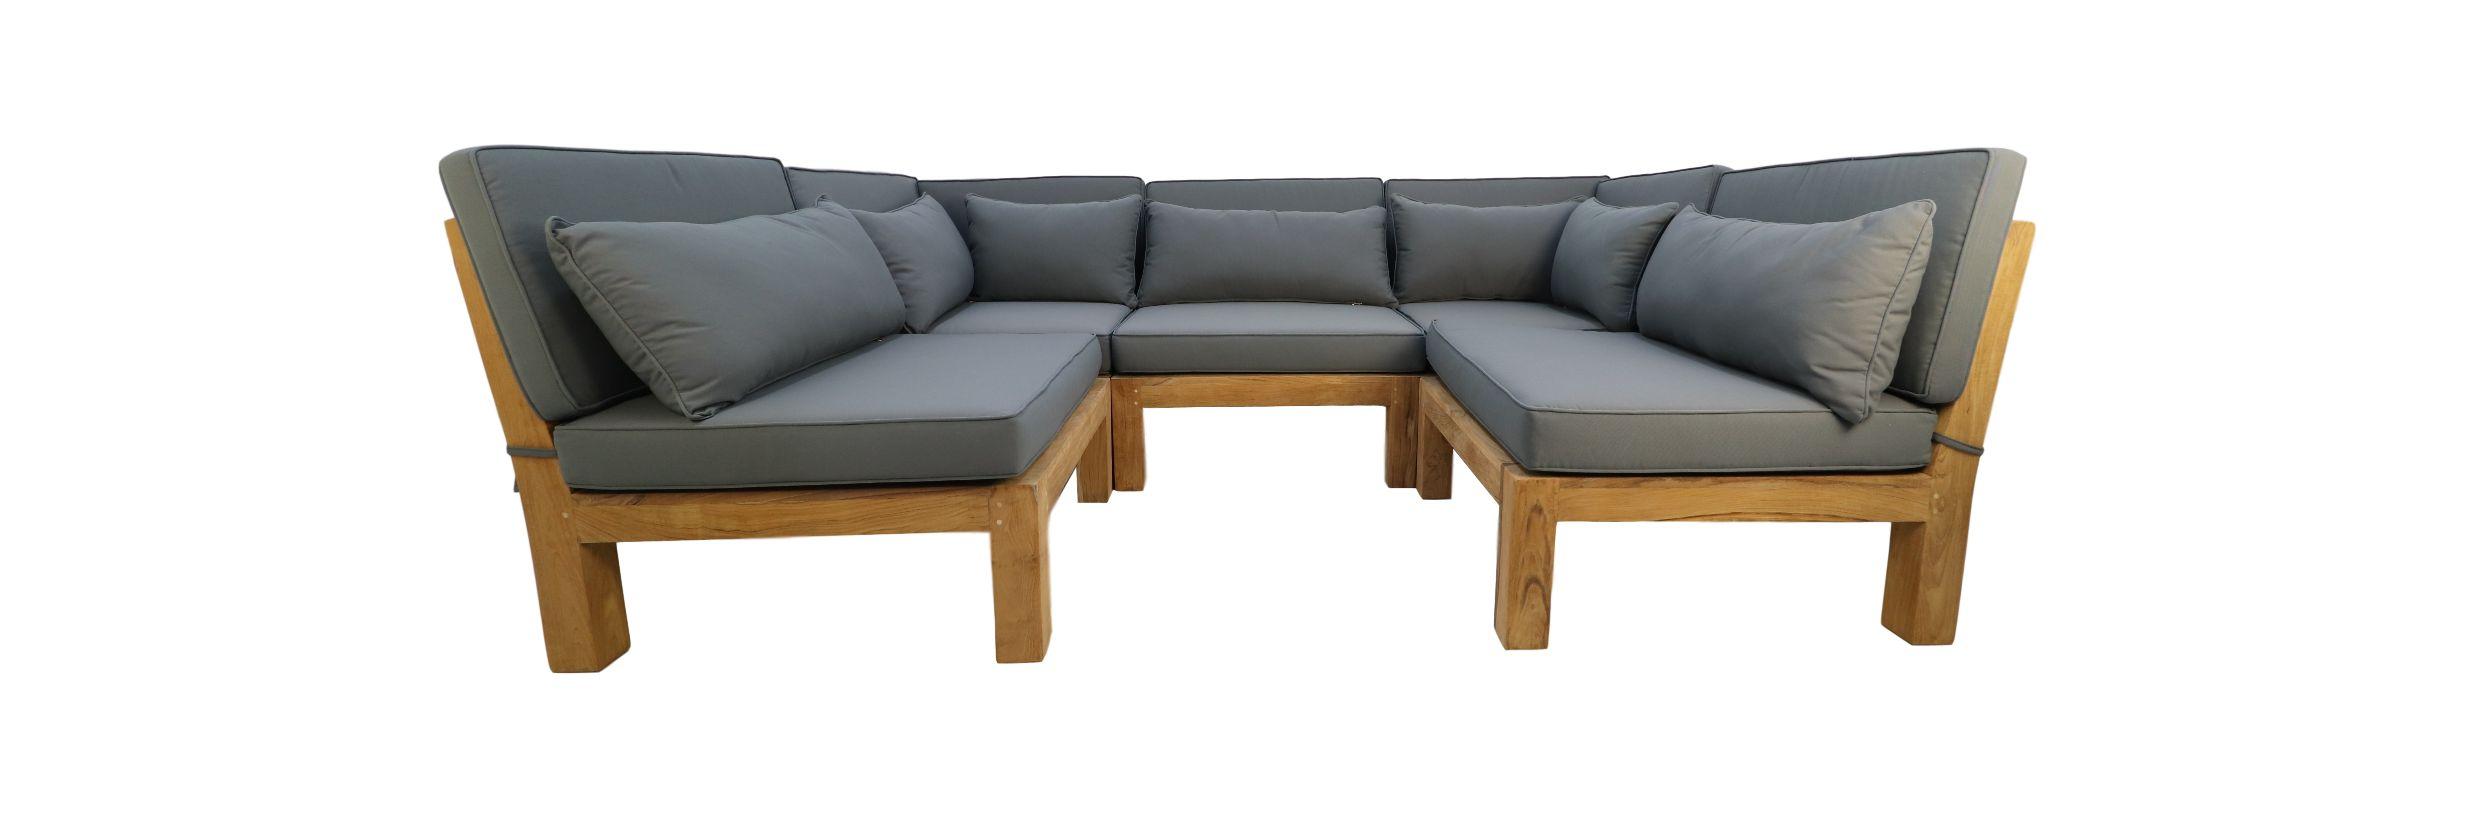 Lounge hoekmodule met kussens Aruba - teak - onbehandeld/dark grey